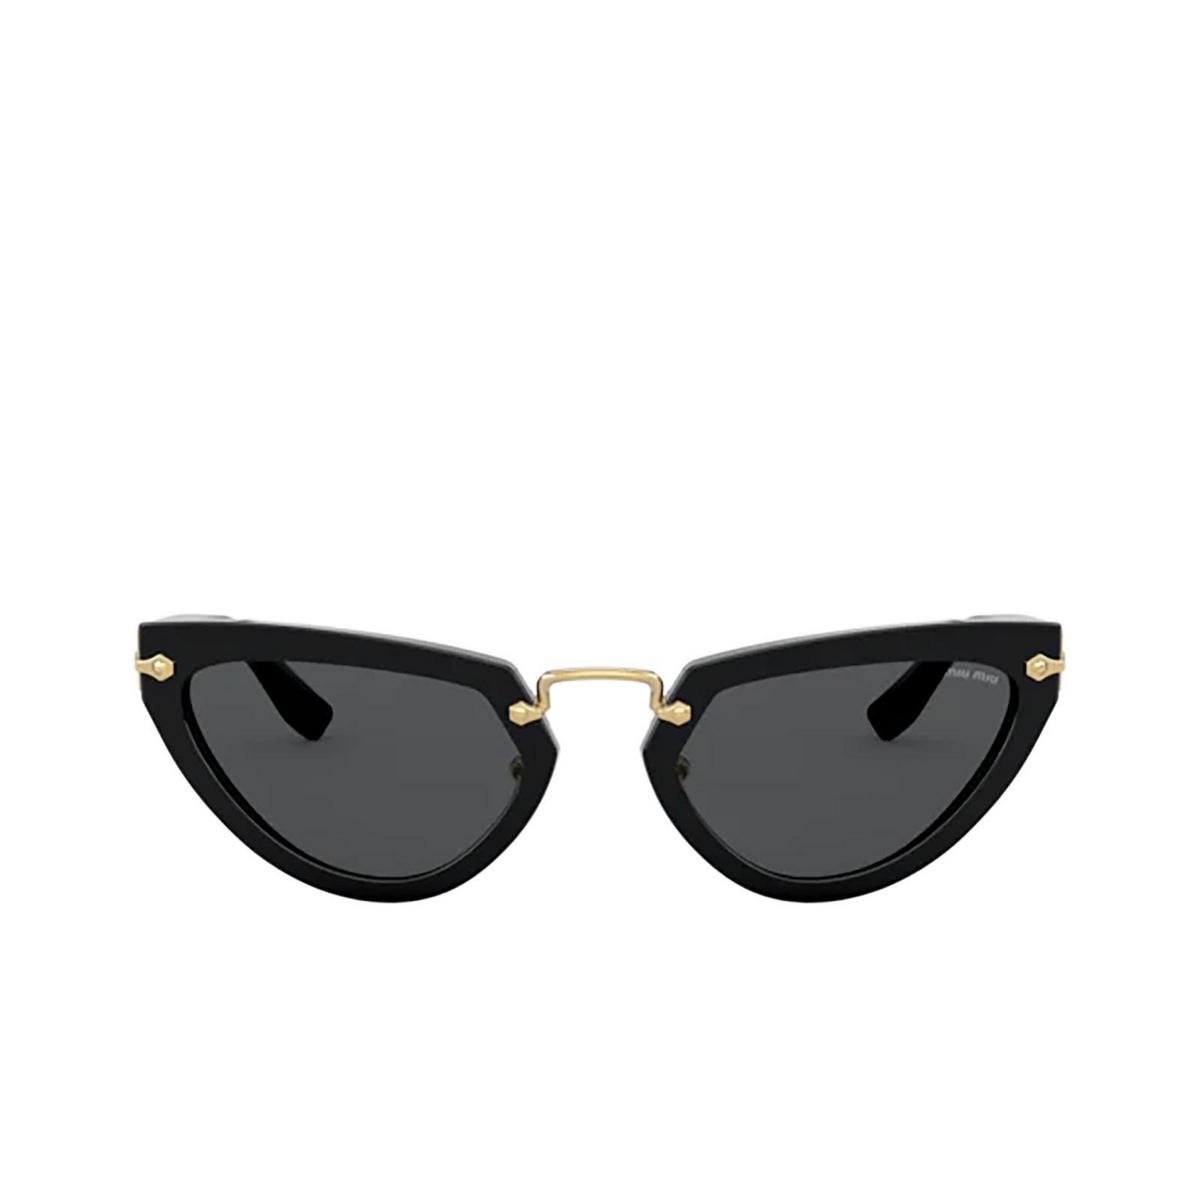 Miu Miu® Cat-eye Sunglasses: Special Project MU 10VS color Black 1AB5S0.